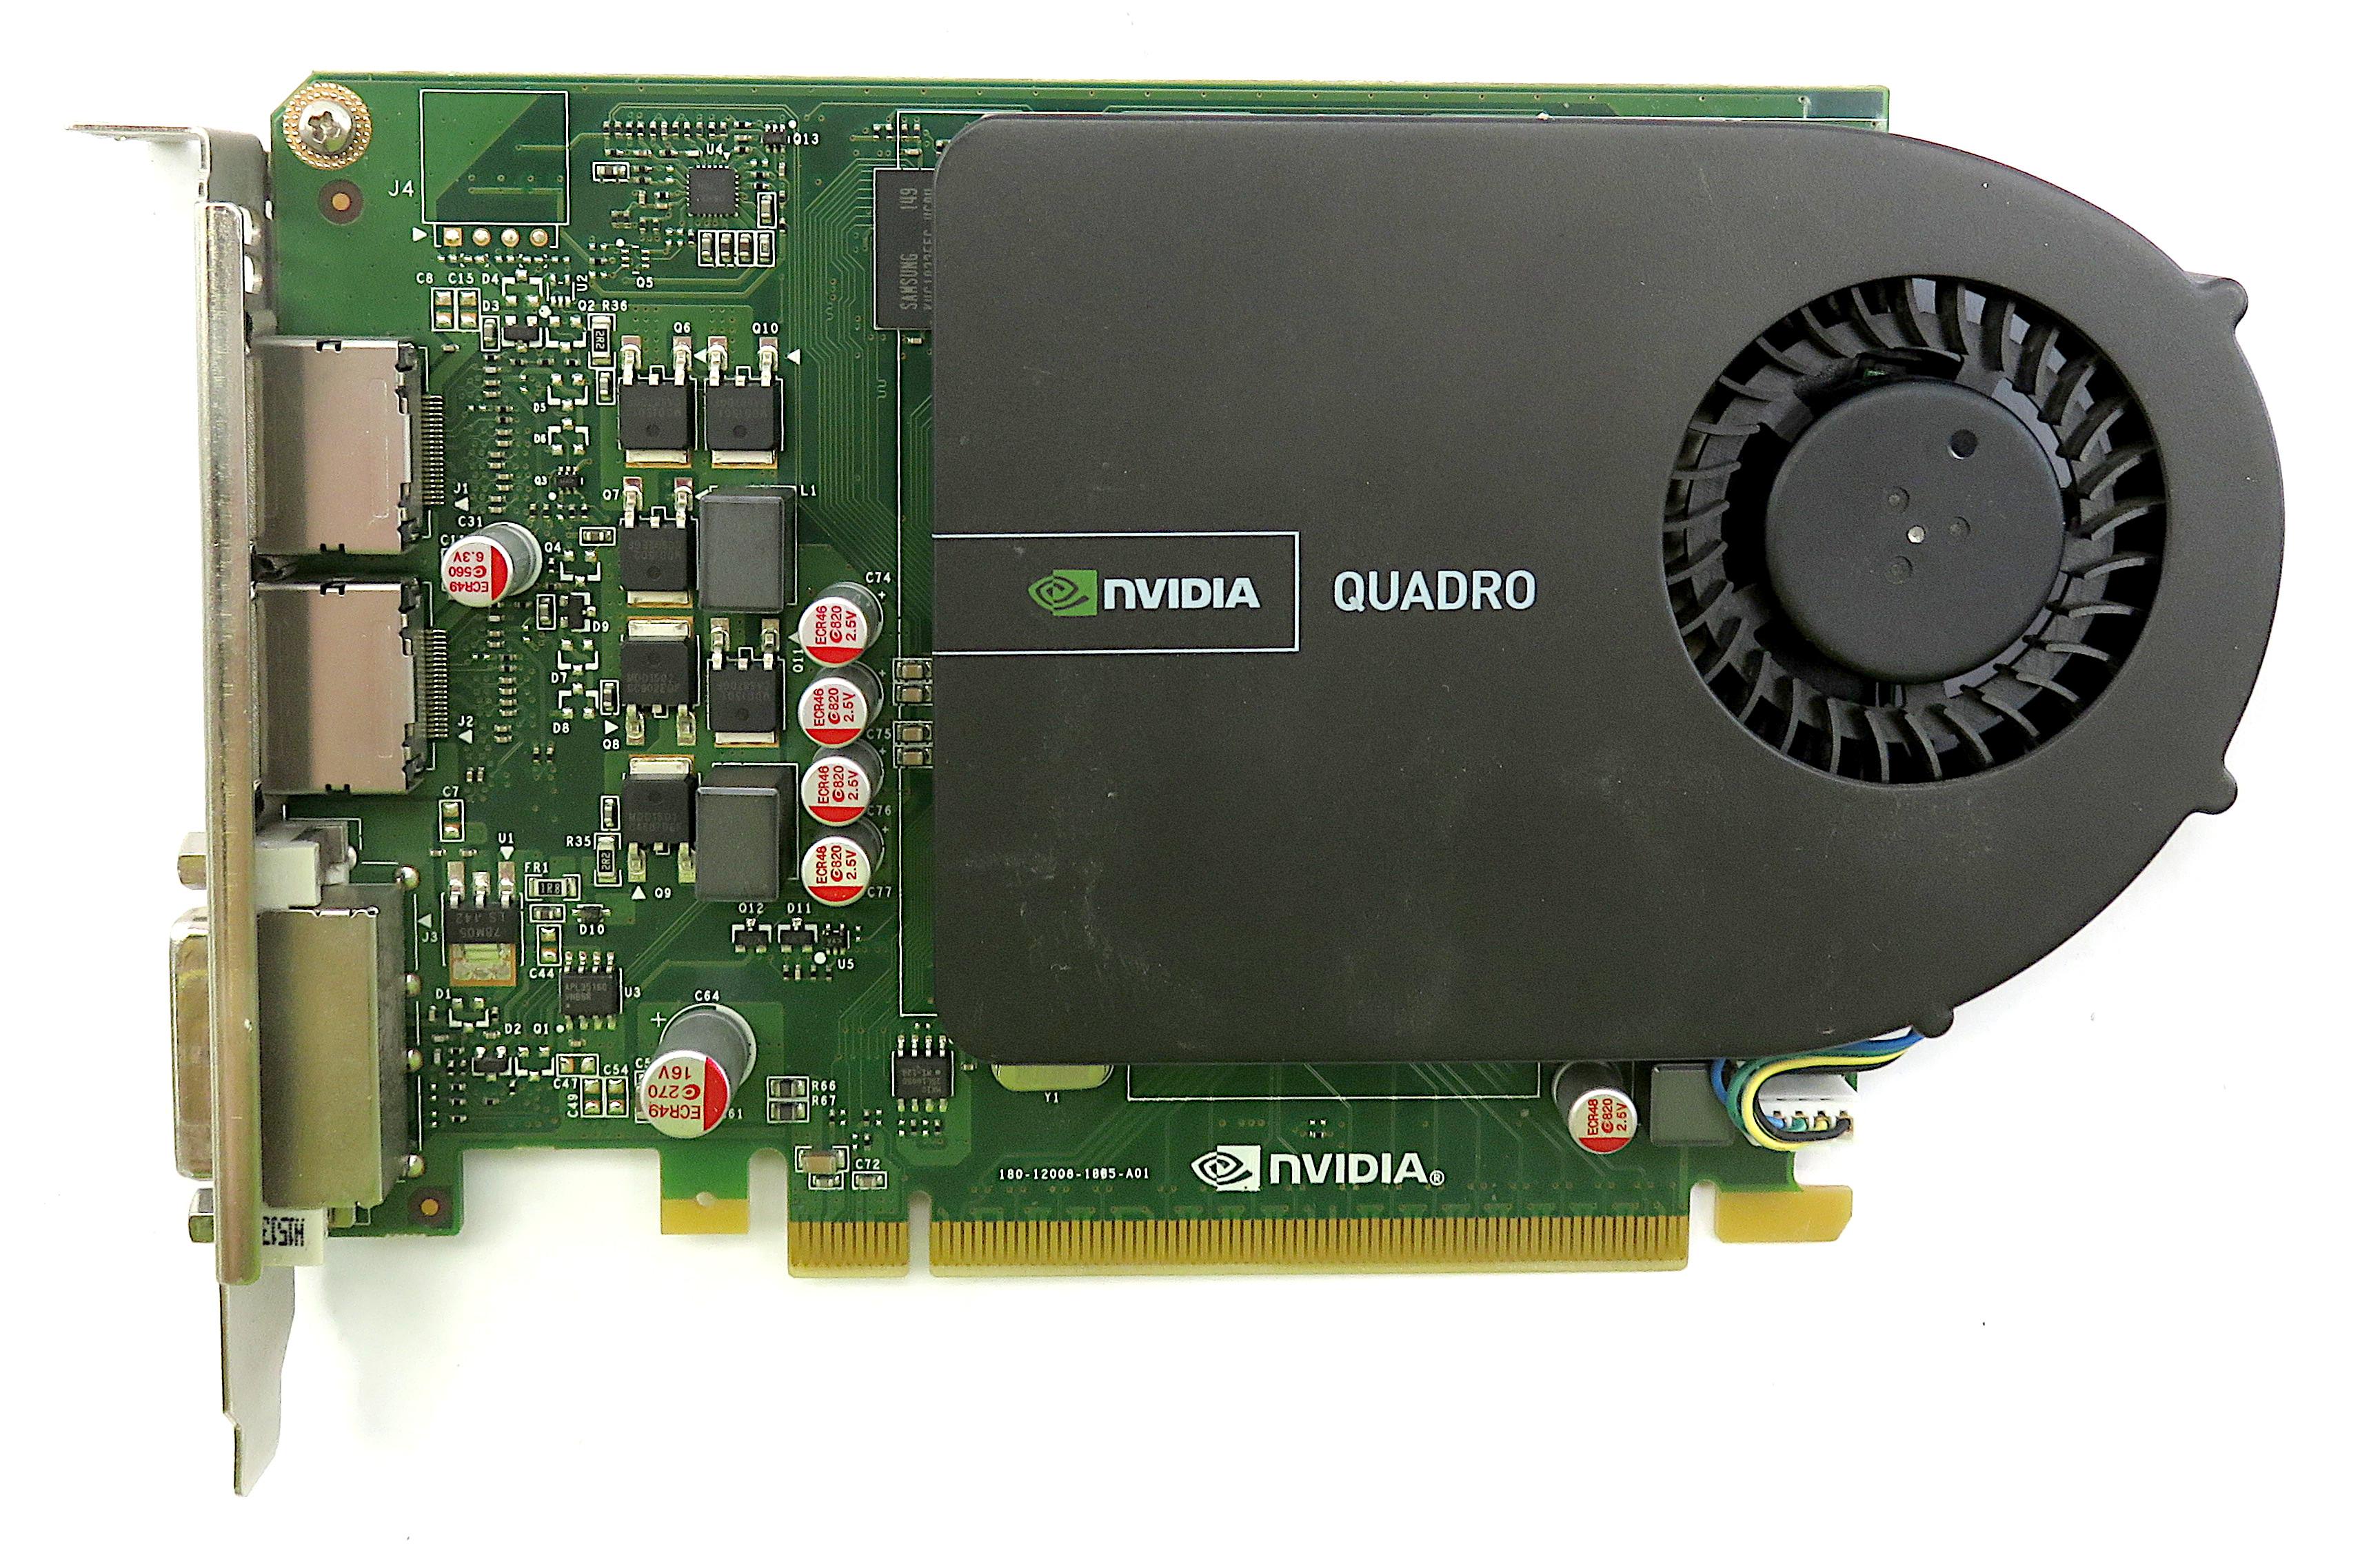 PNY VCQ2000V2-T Nvidia Quadro 2000 PCIe 1GB DVI-I/ Dual Display Graphics Card